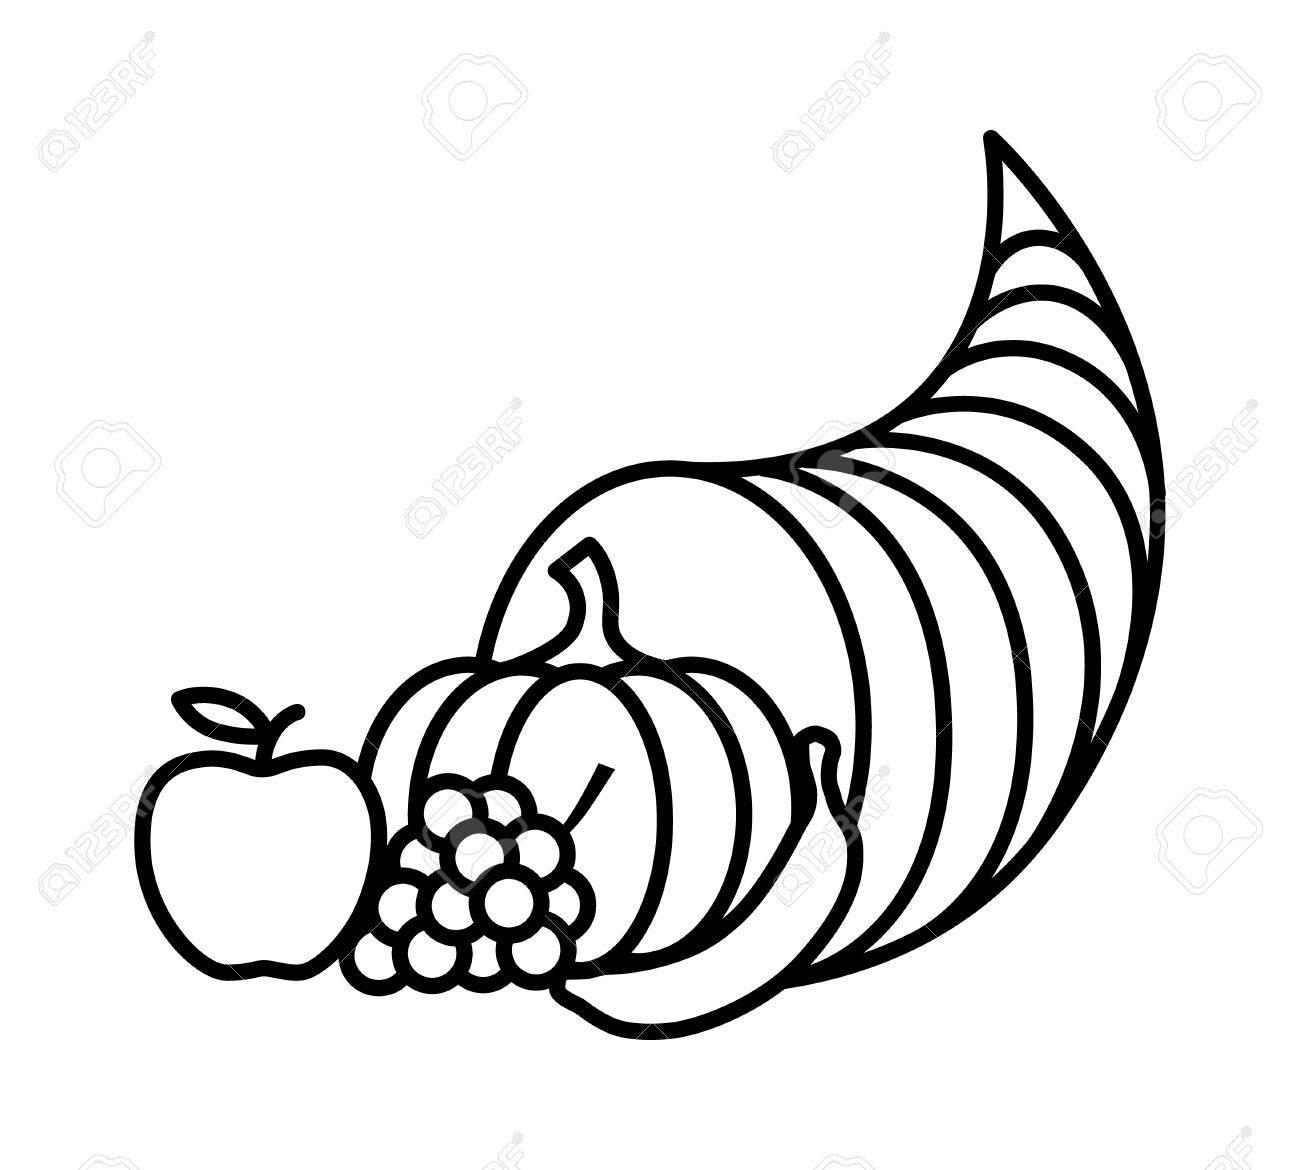 cornucopia horn of plenty or thanksgiving basket line art icon rh 123rf com